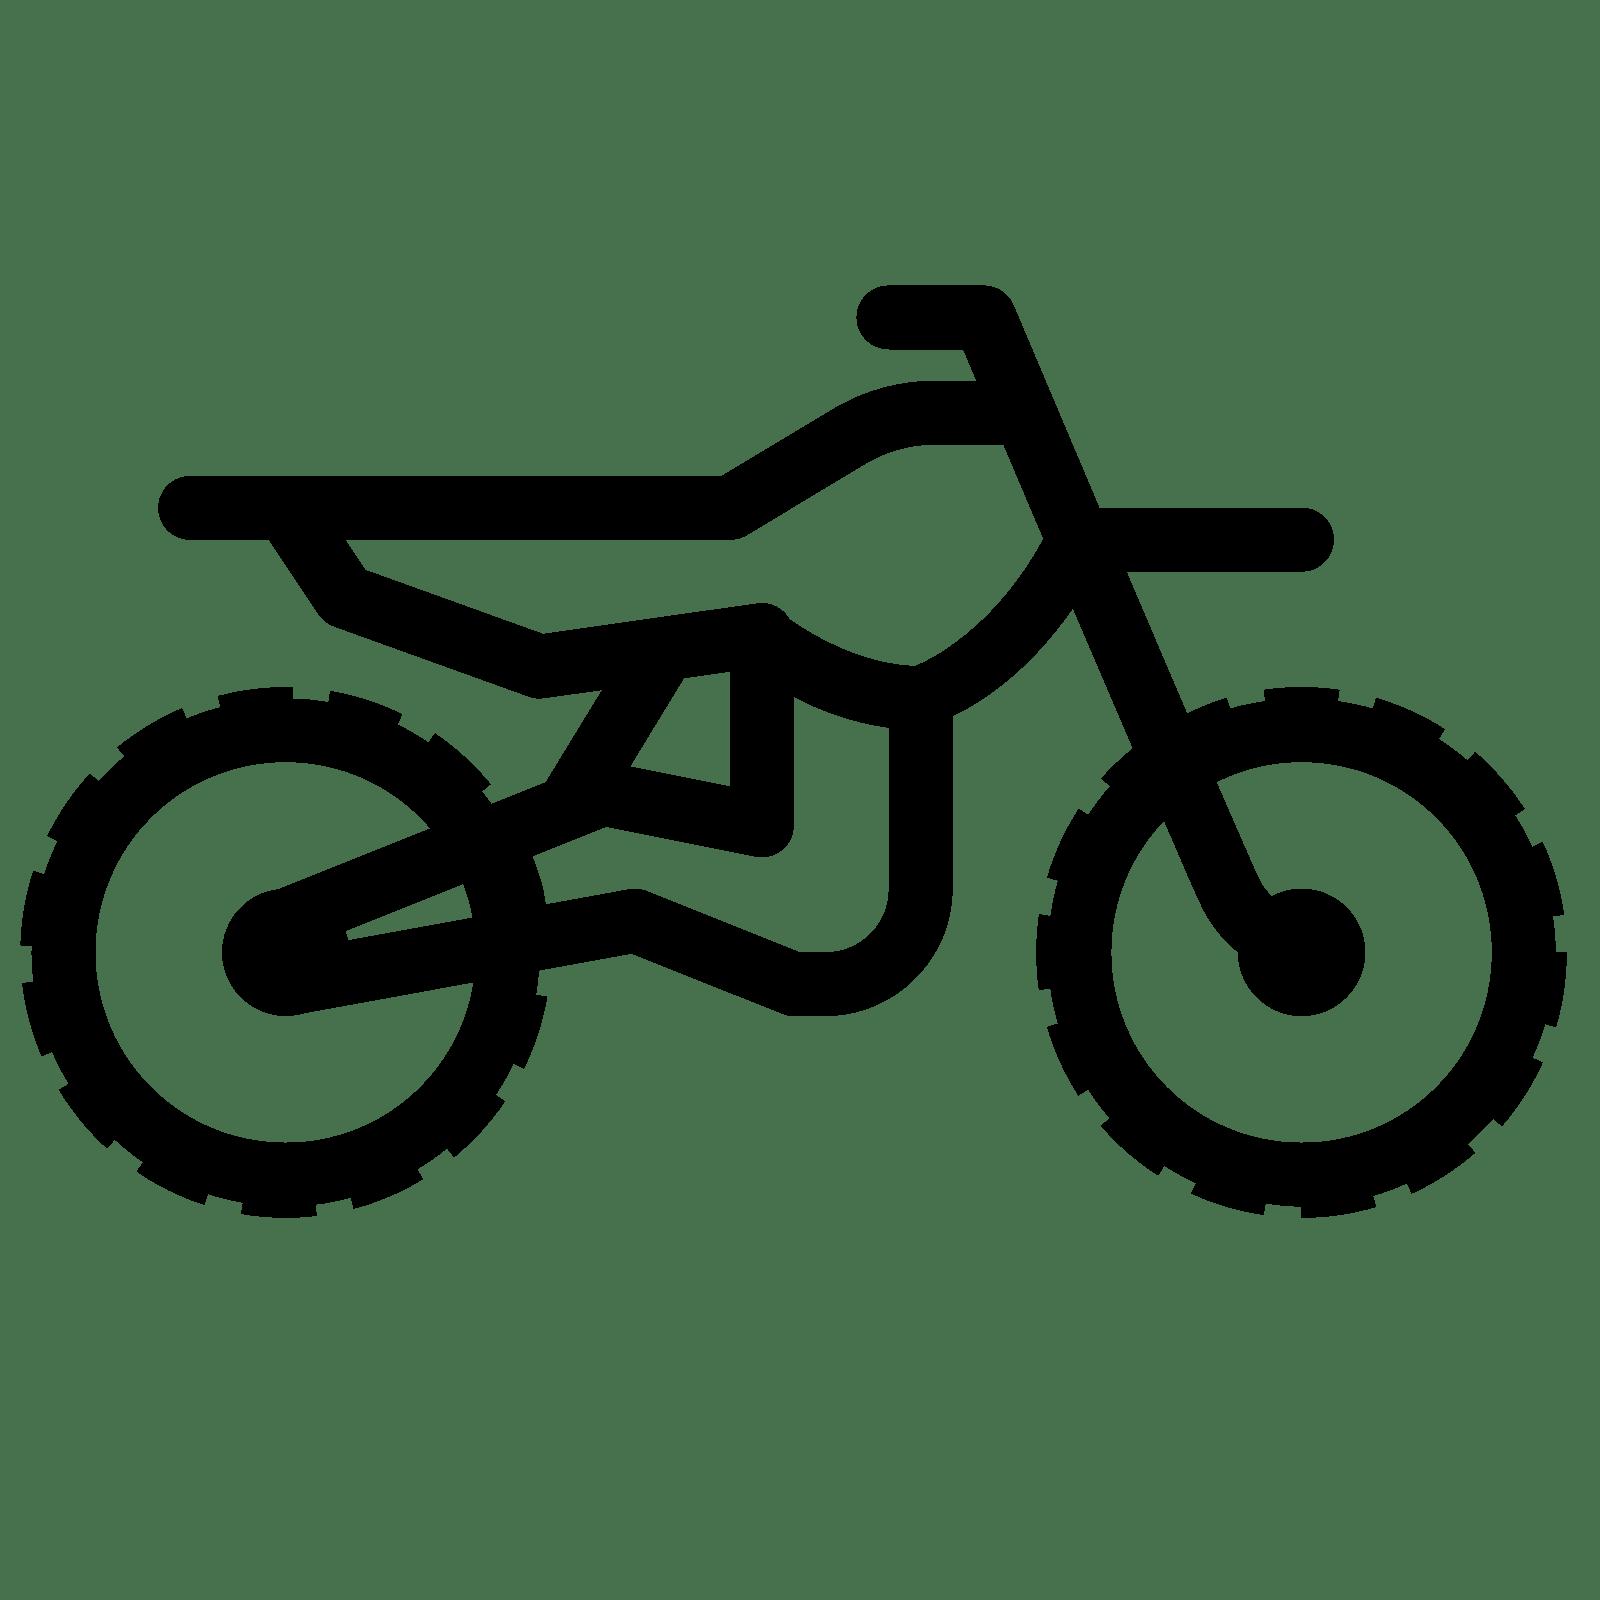 hight resolution of dirt bike png free pluspng com 1600 dirt bike png free